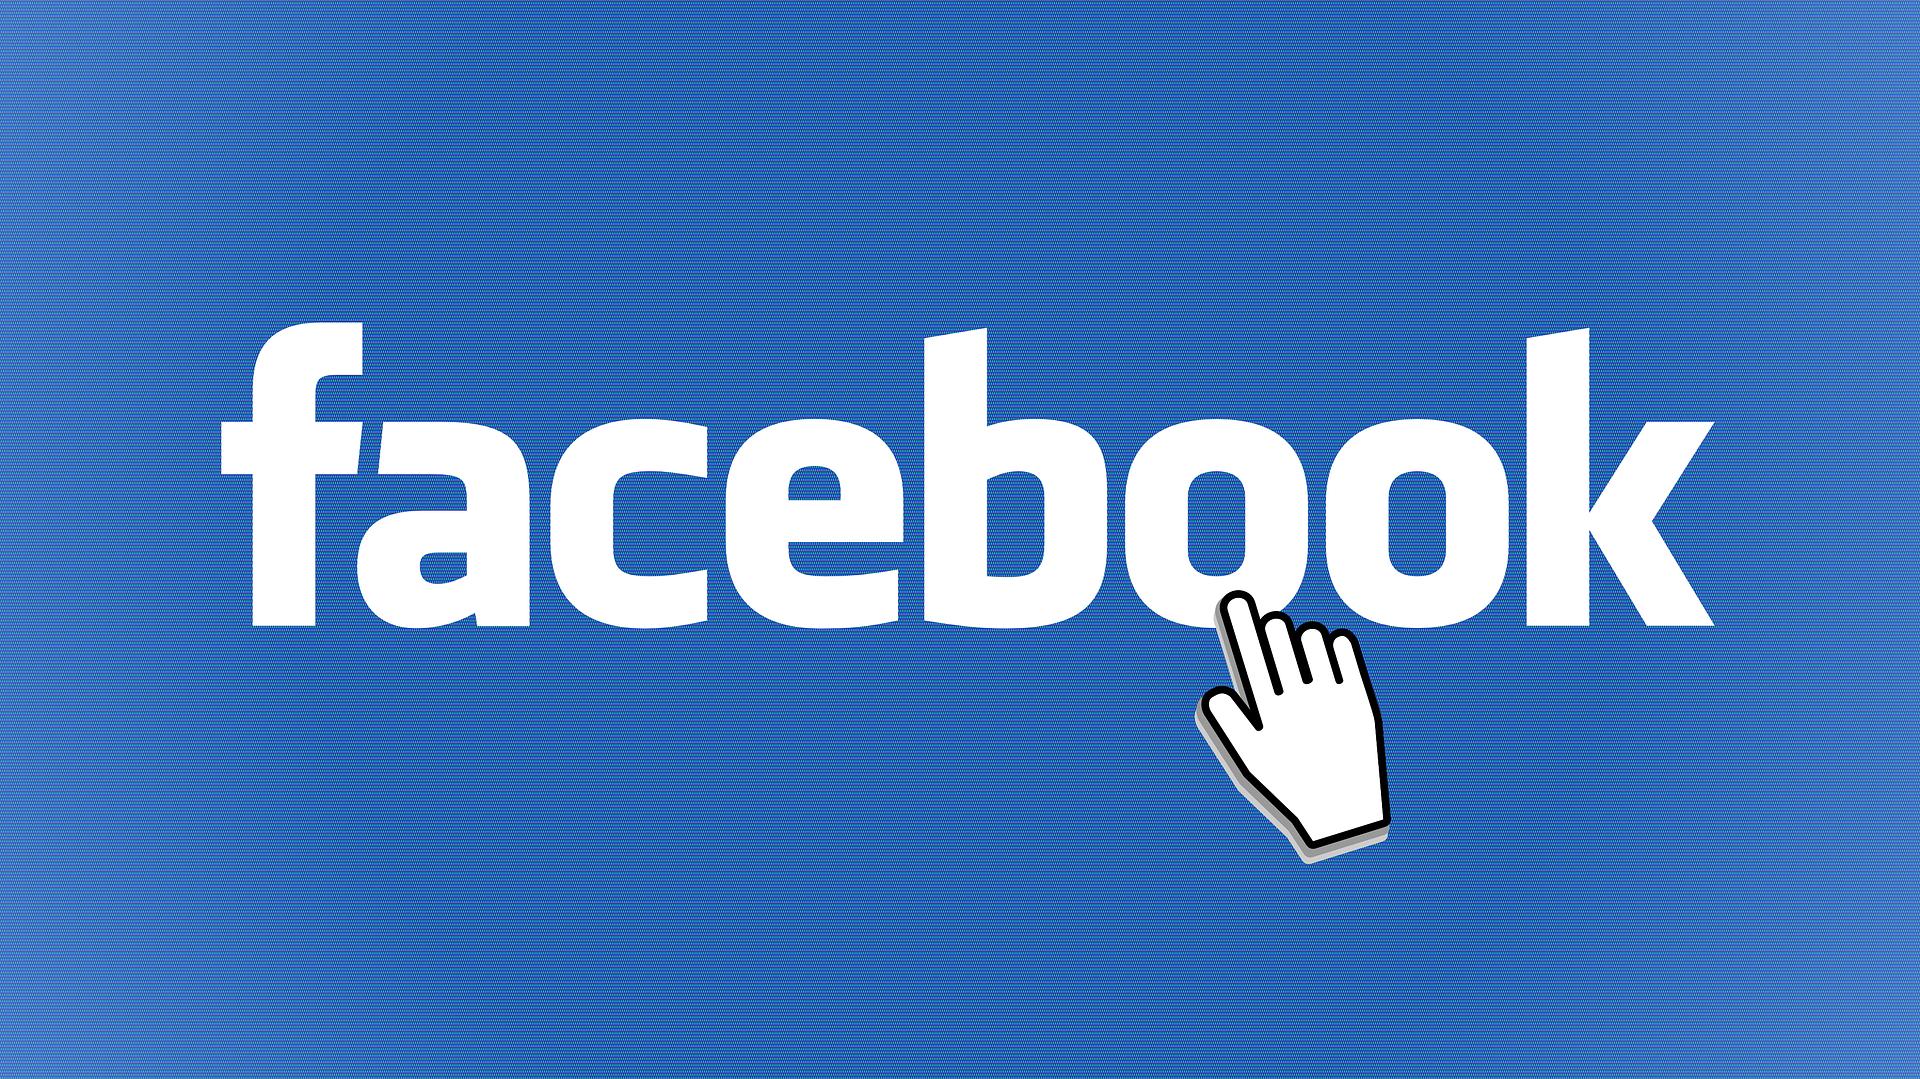 Facebook aan banden gelegd